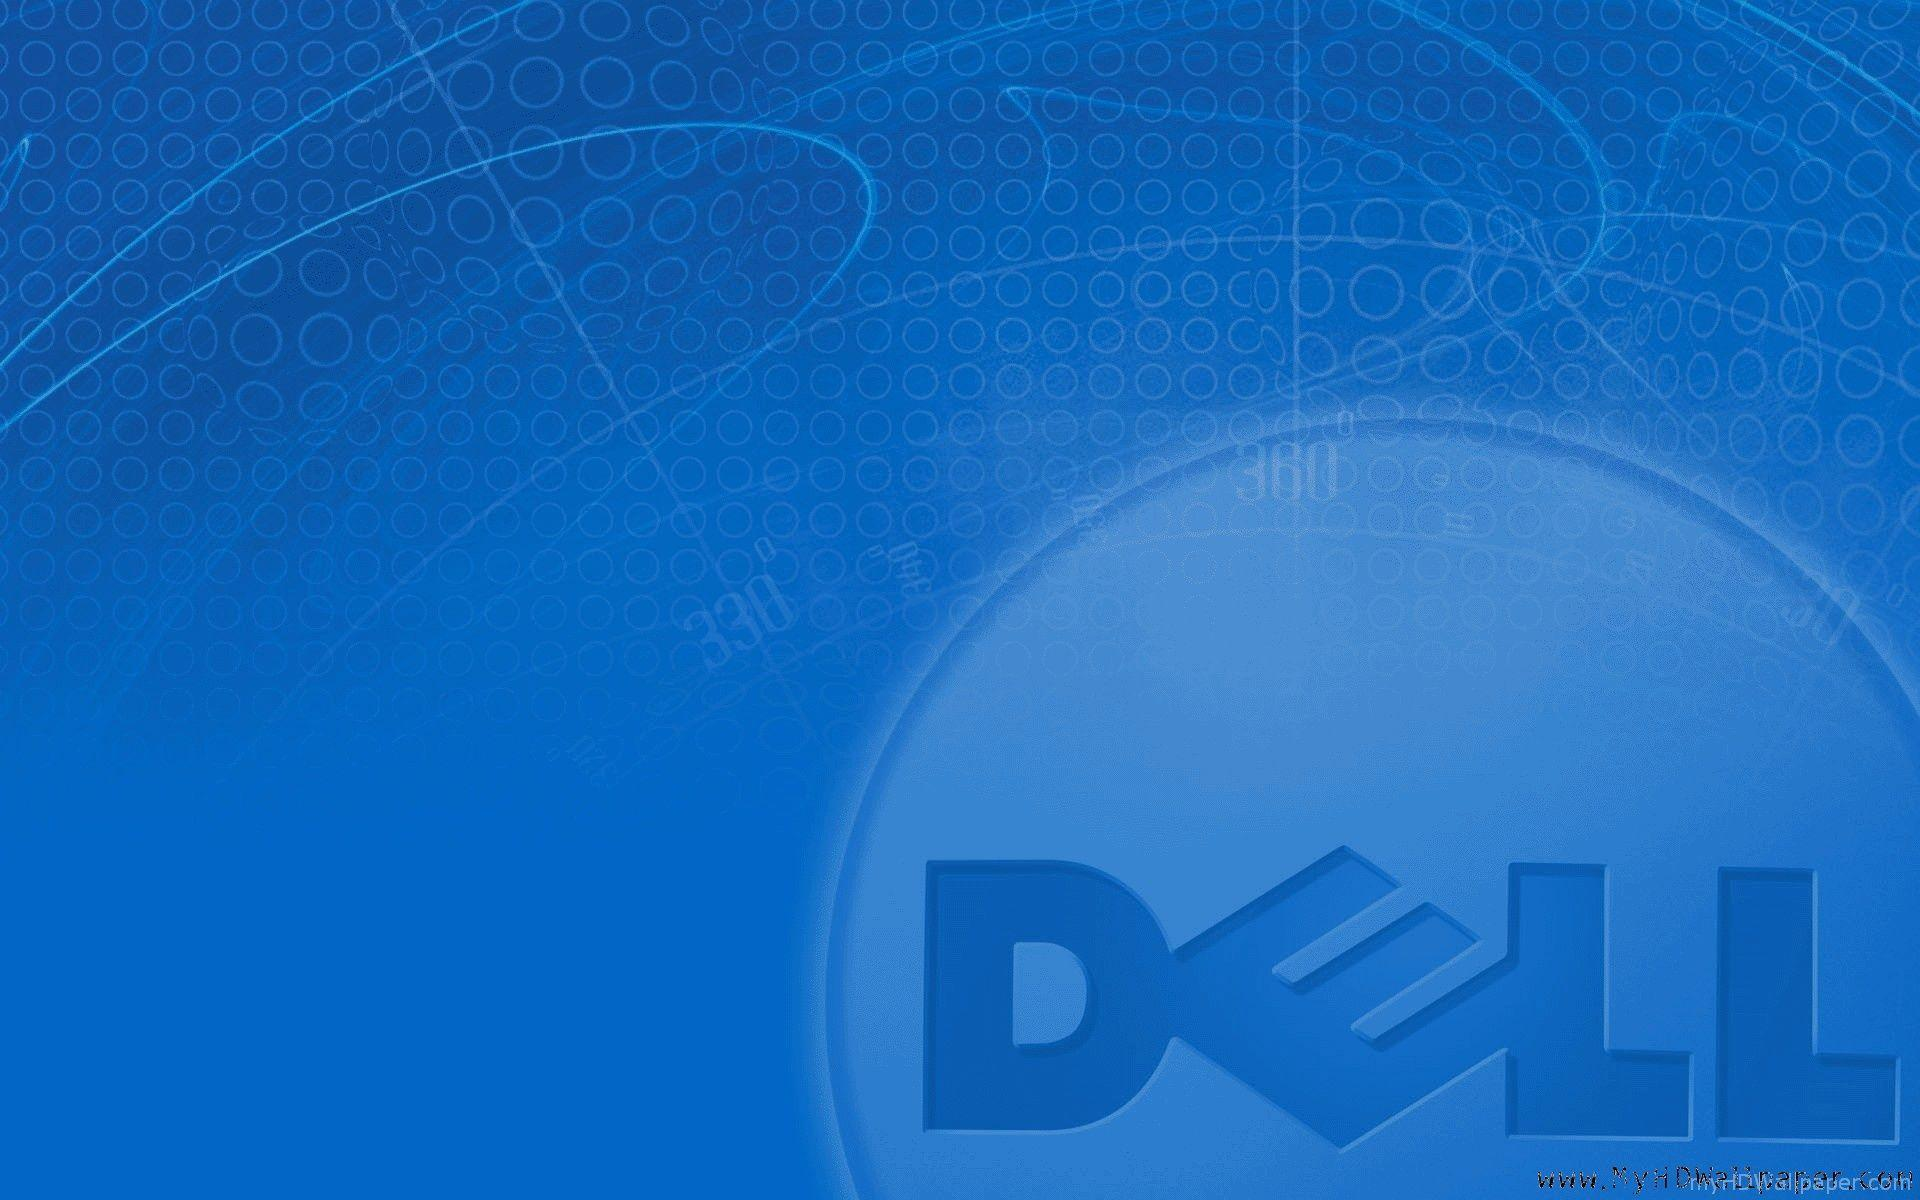 Dell Desktop Backgrounds Wallpapers 1920x1200 S1YB42Y   Picseriocom 1920x1200